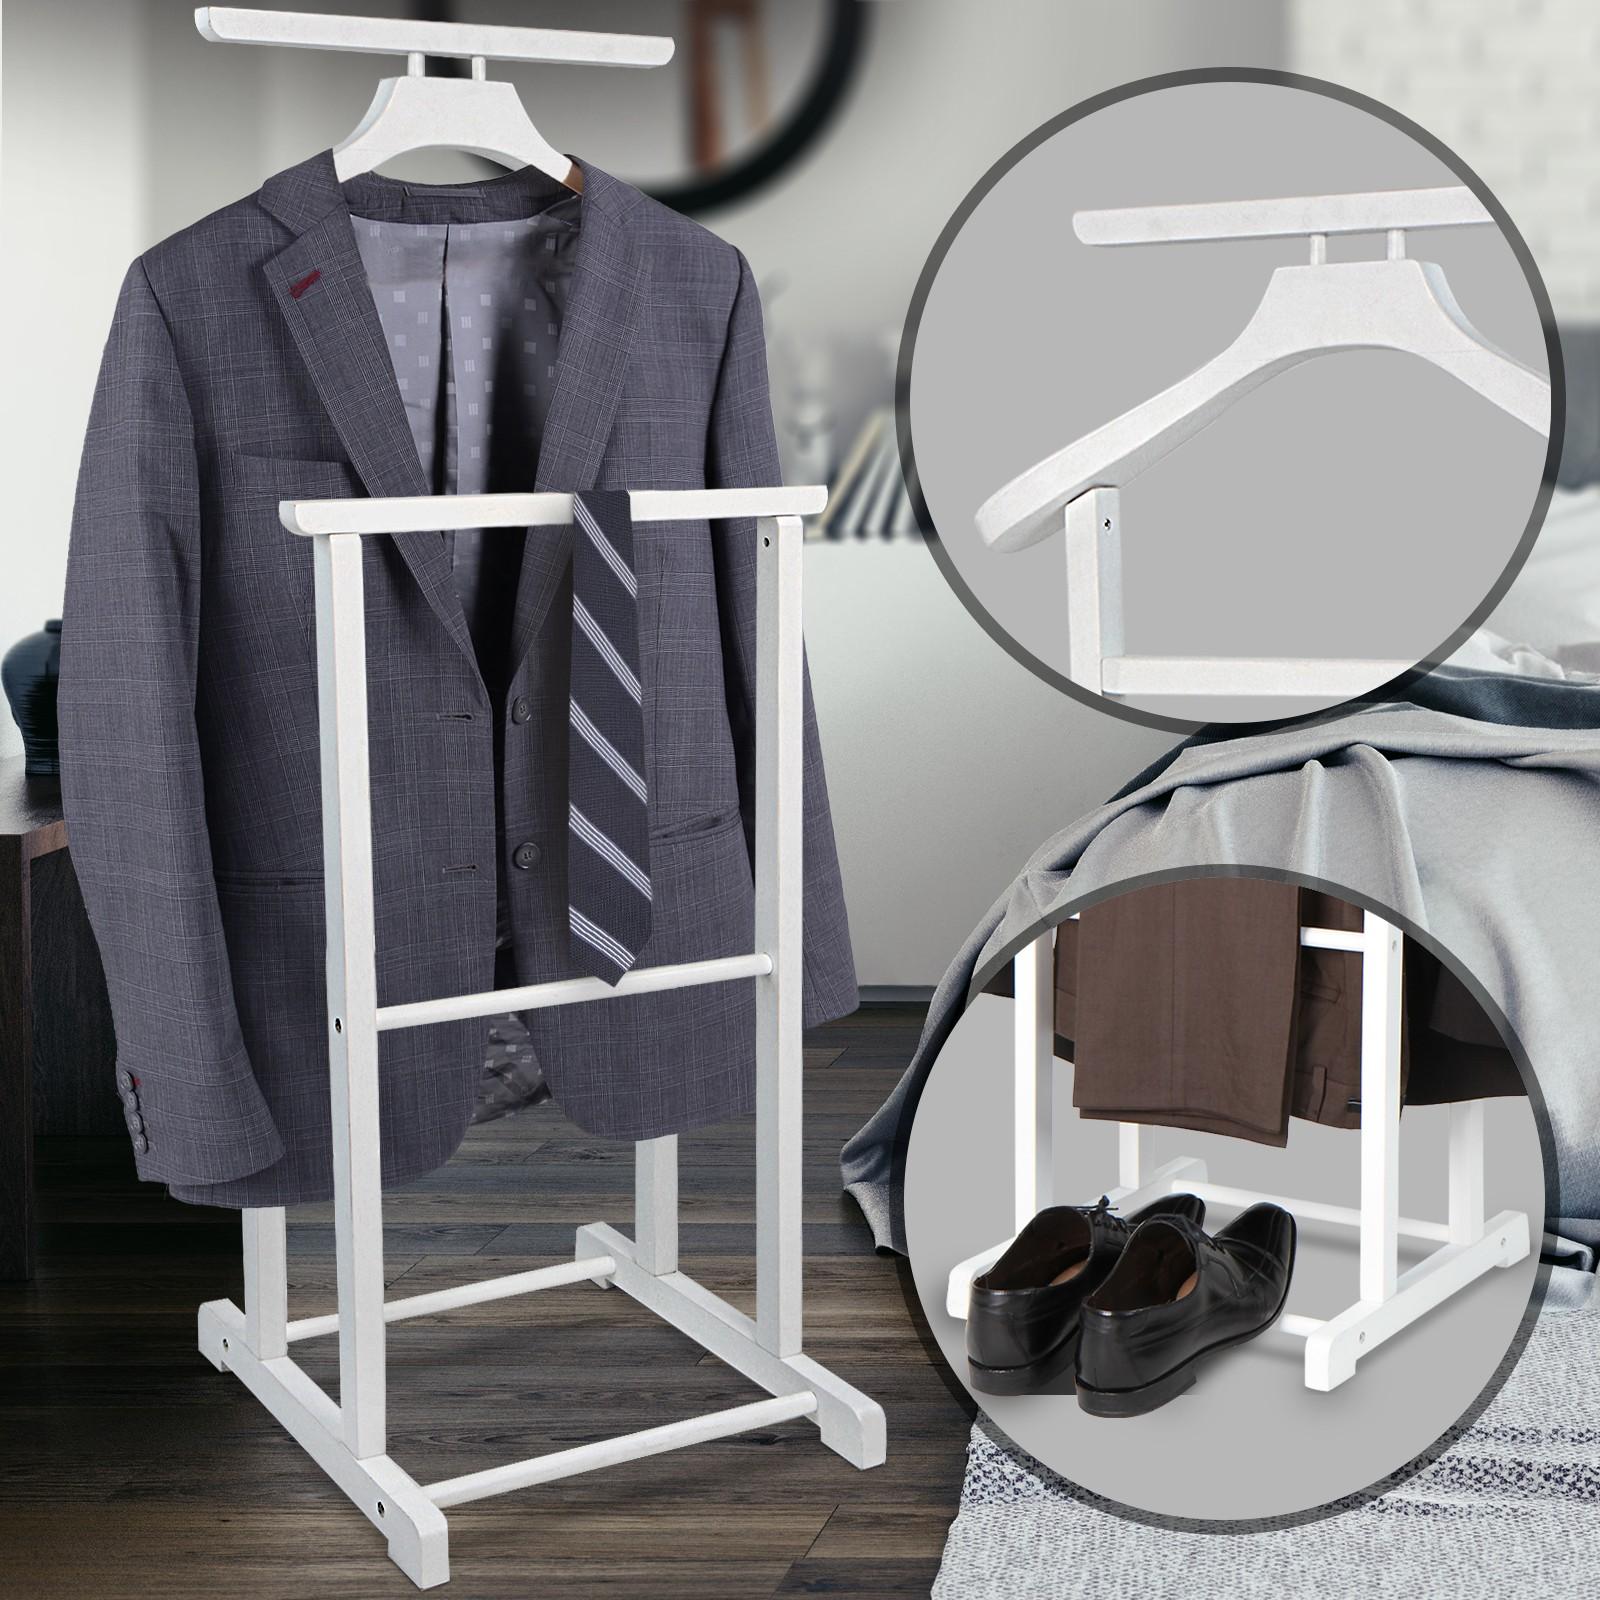 Herrendiener Weiss Holz Kleiderstander Garderobenstander Stummer Diener Butler